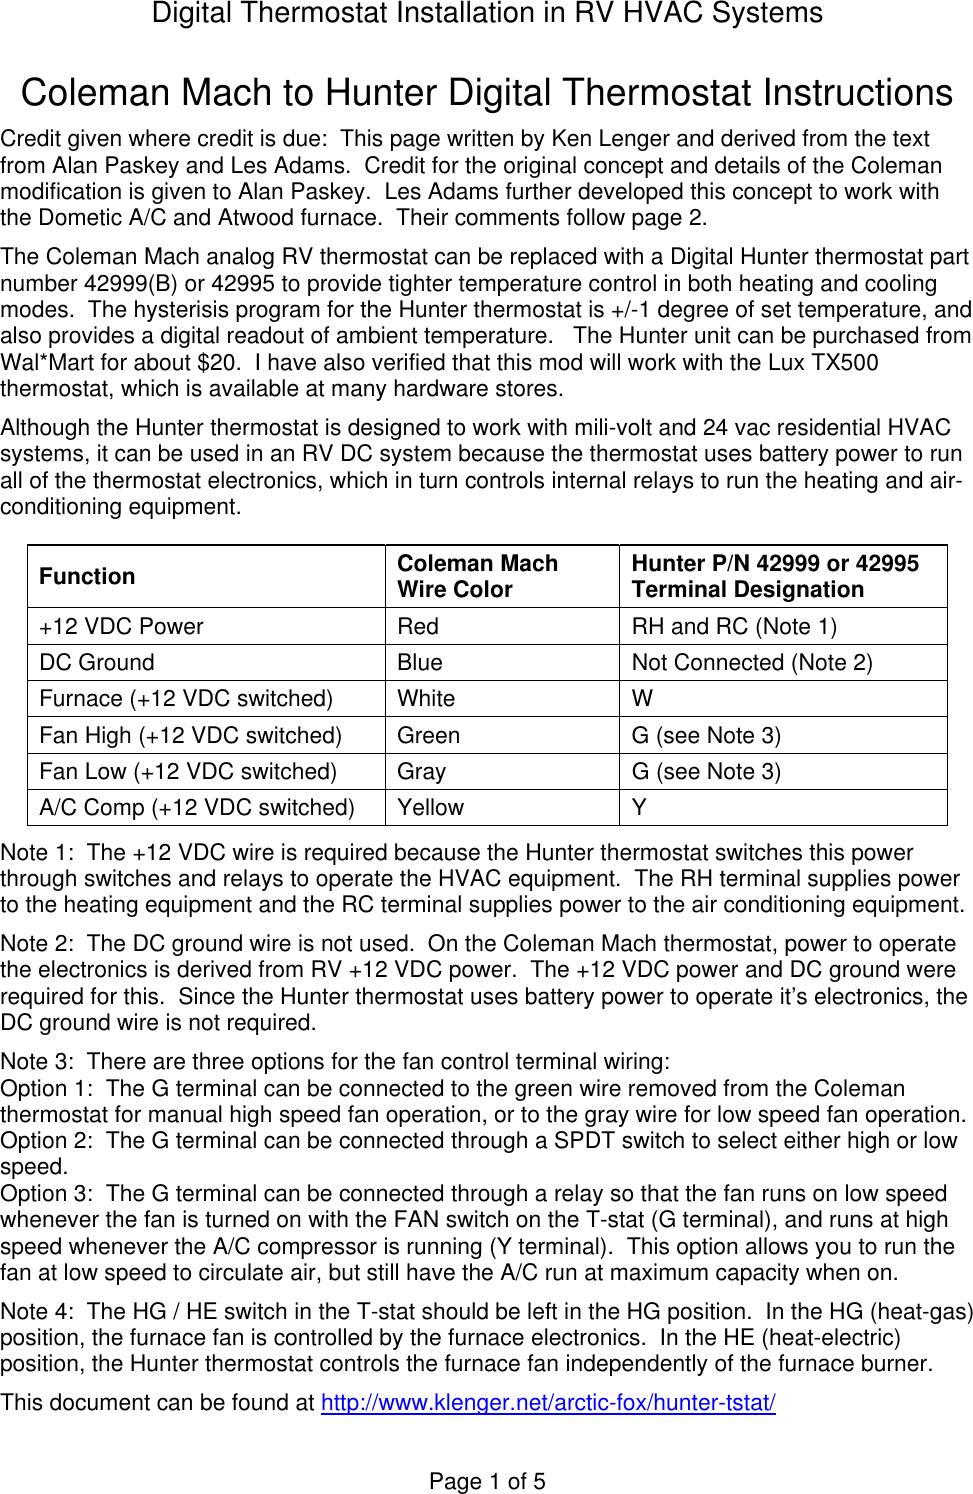 Hunter Fan Thermostat 42995 Users Manual Digital Tstat Instructions Coleman Rv Mach 3 Wiring